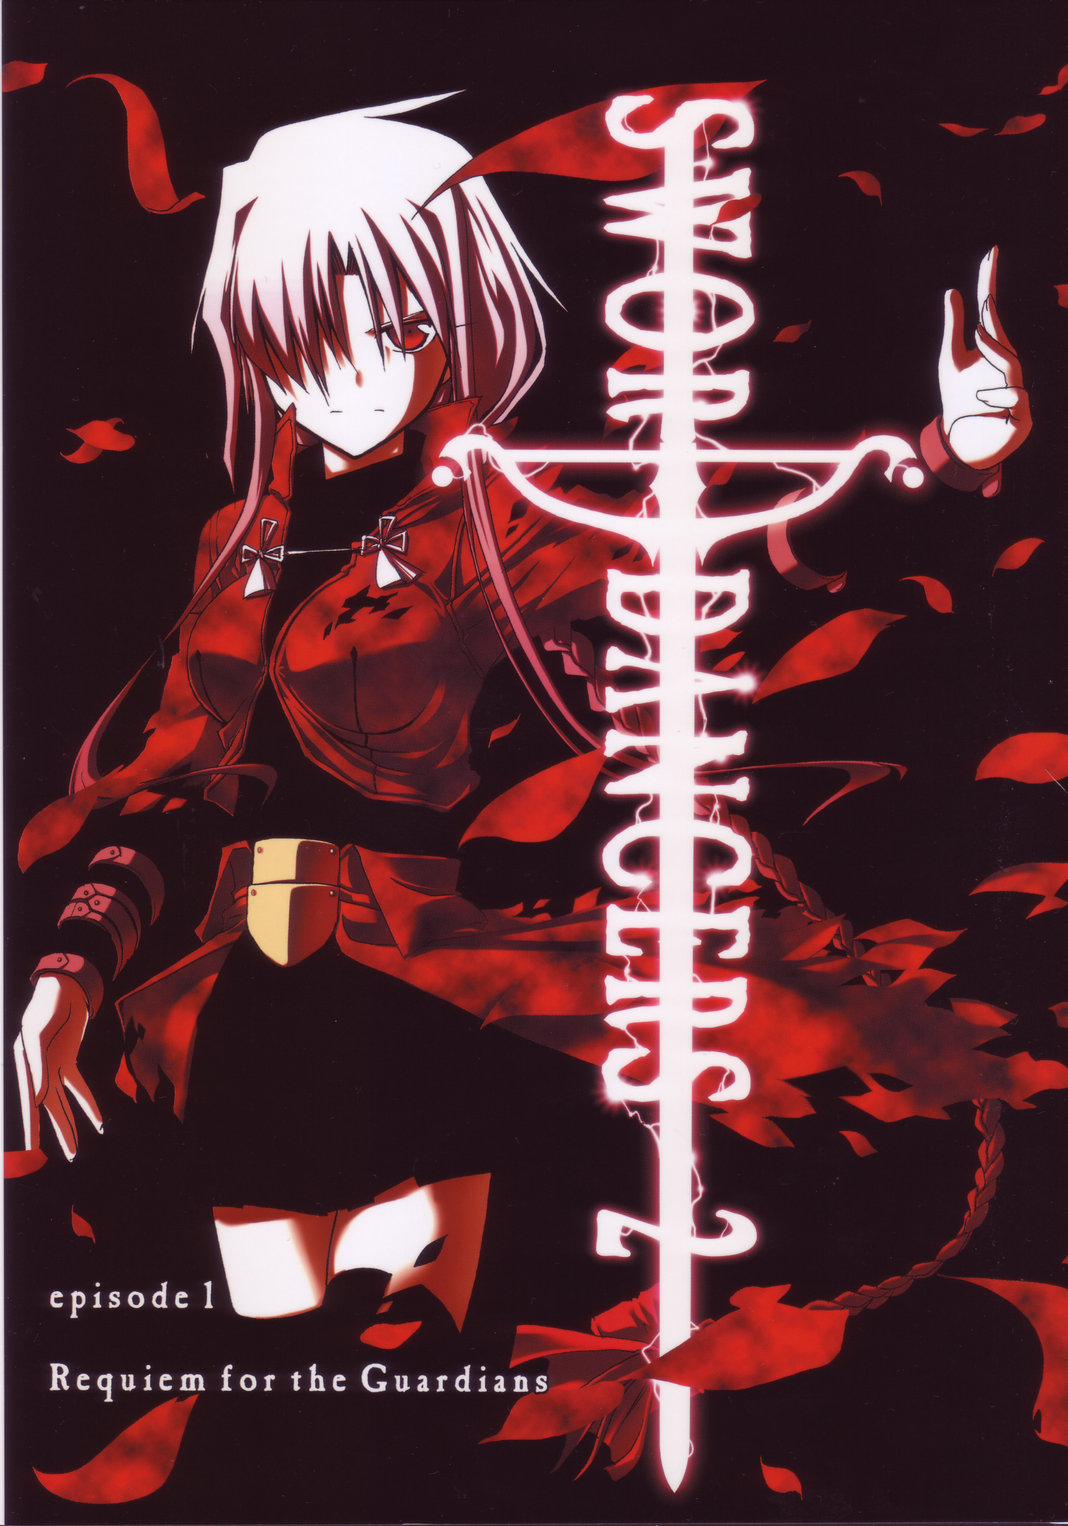 The original Kuro, introducing Archeko